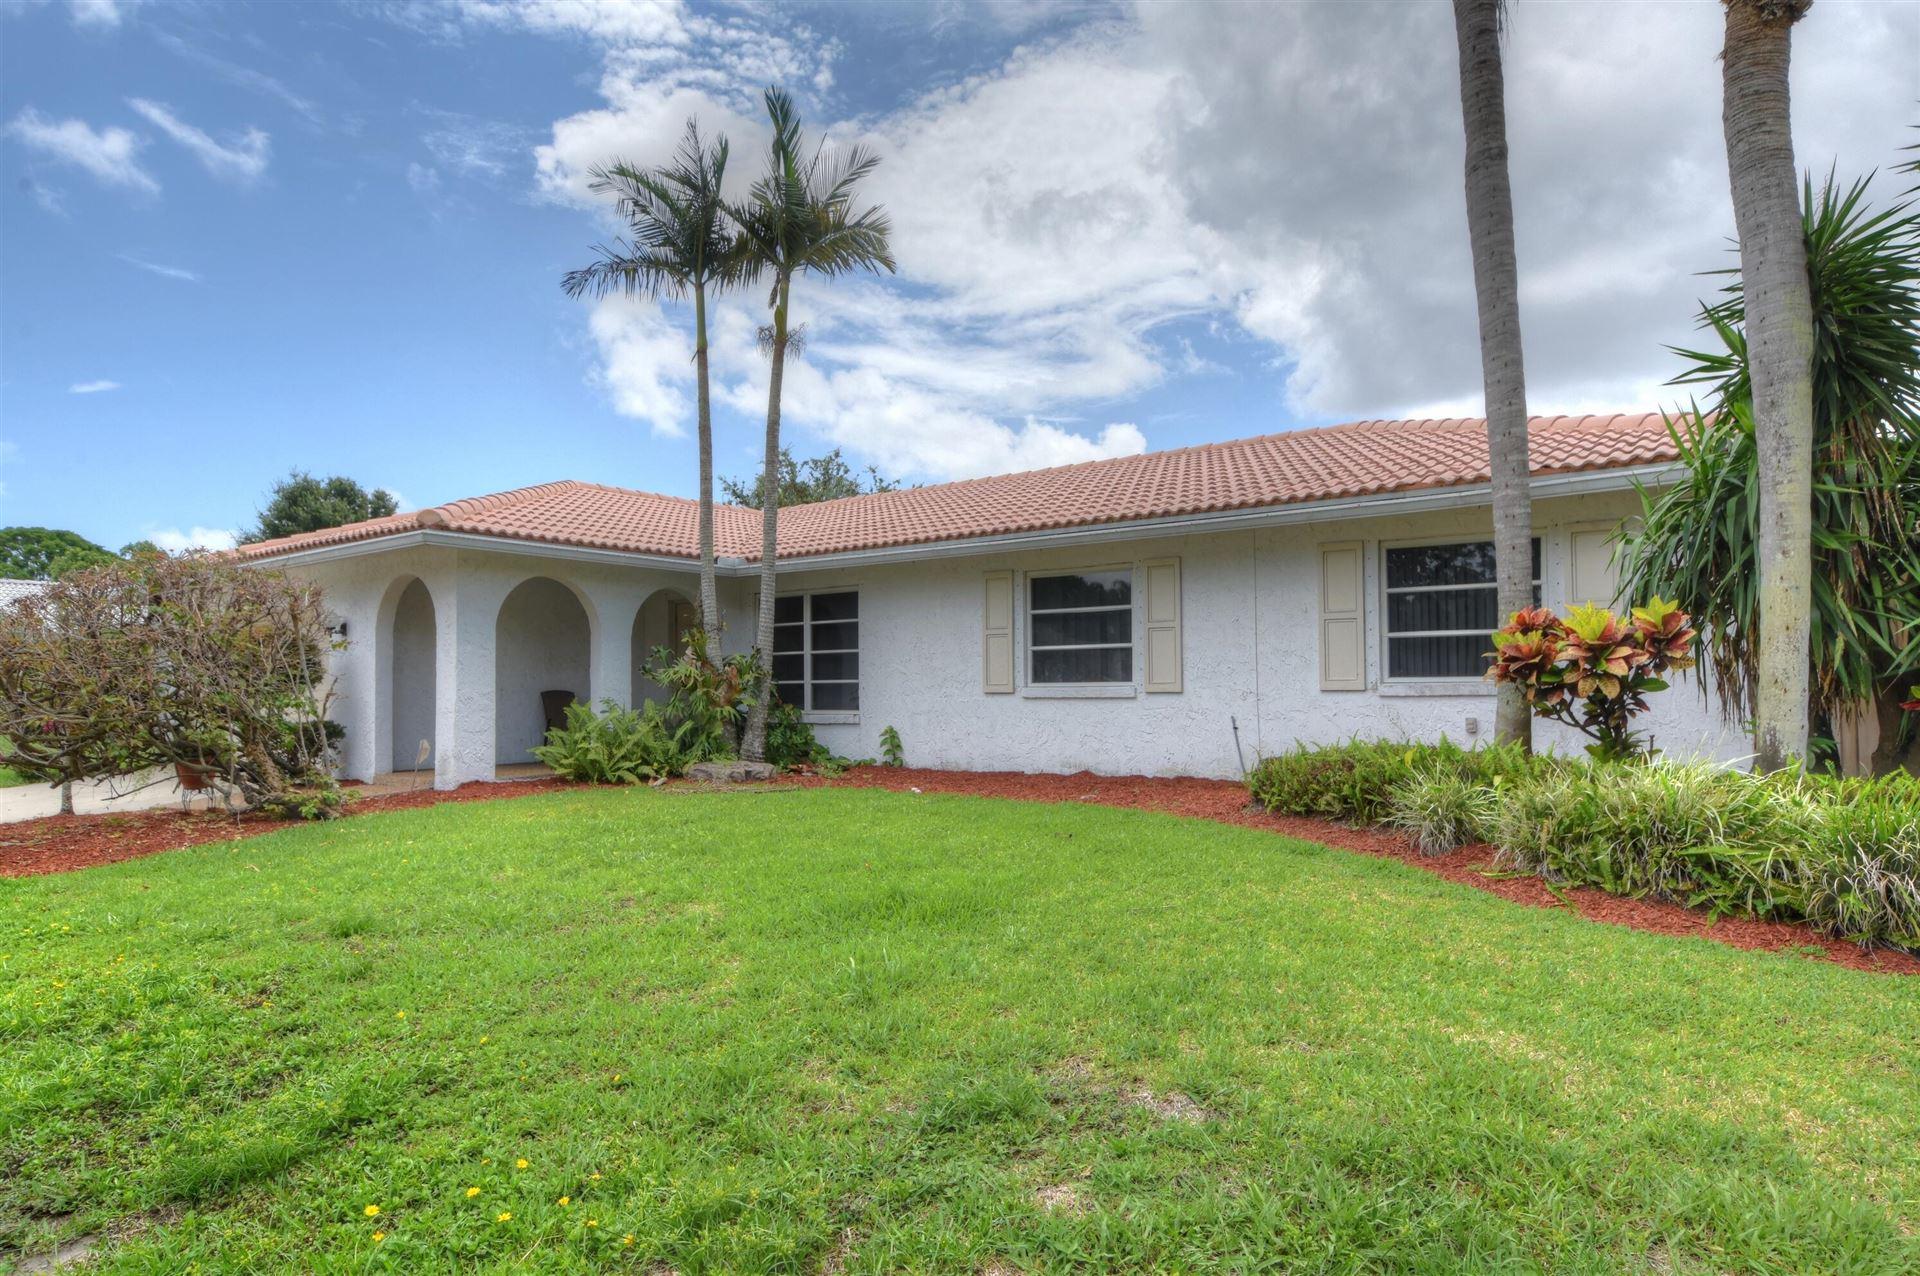 2600 NW 32nd Street, Boca Raton, FL 33434 - MLS#: RX-10721217